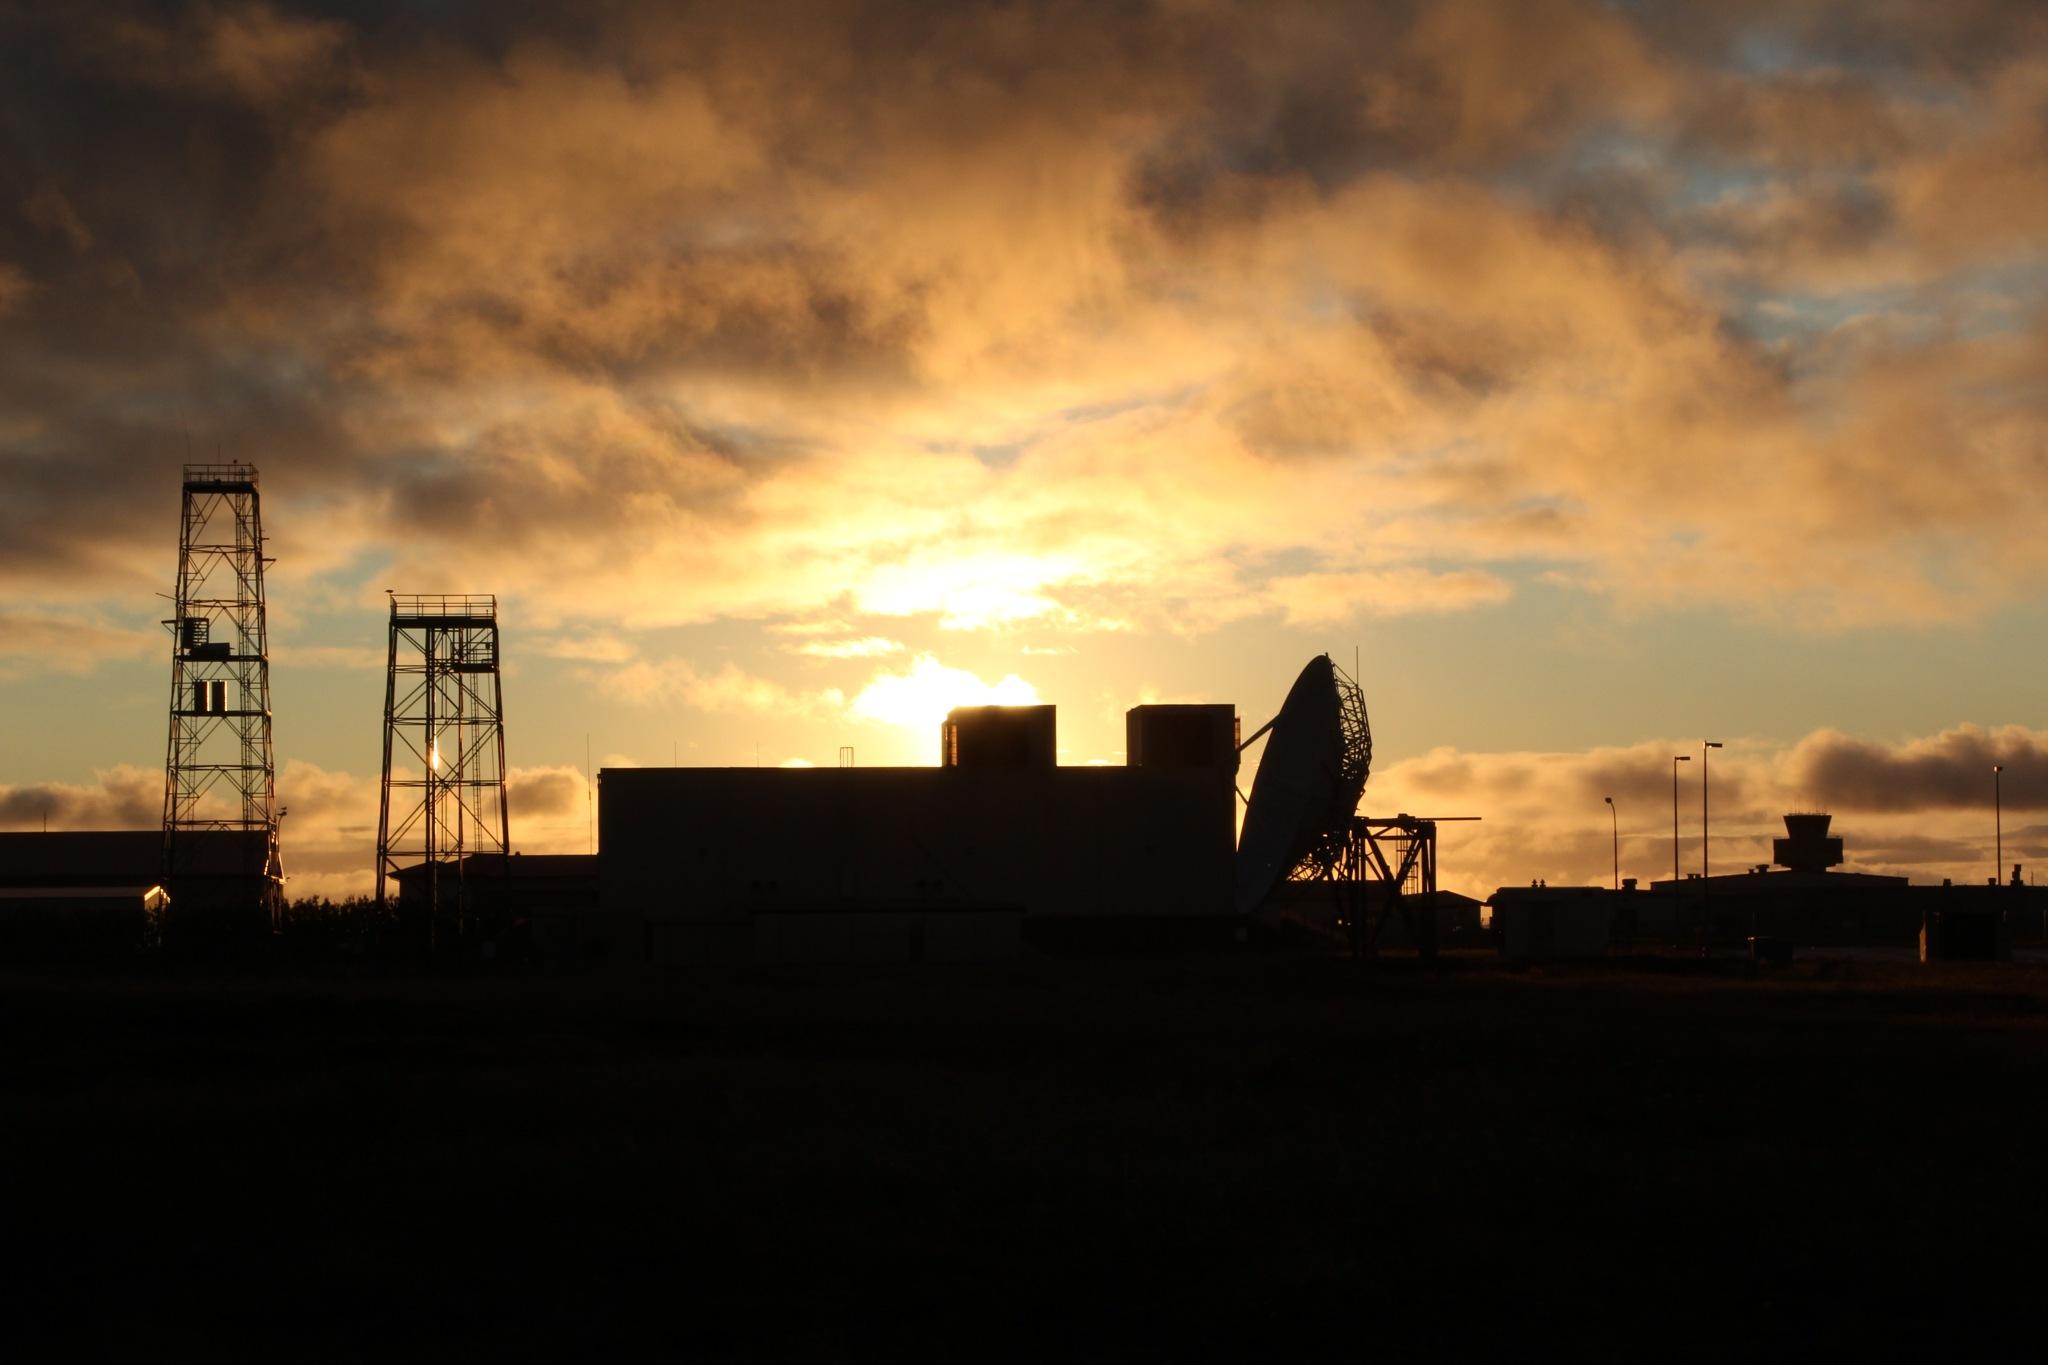 Air Force Base Sunset by John Hillman